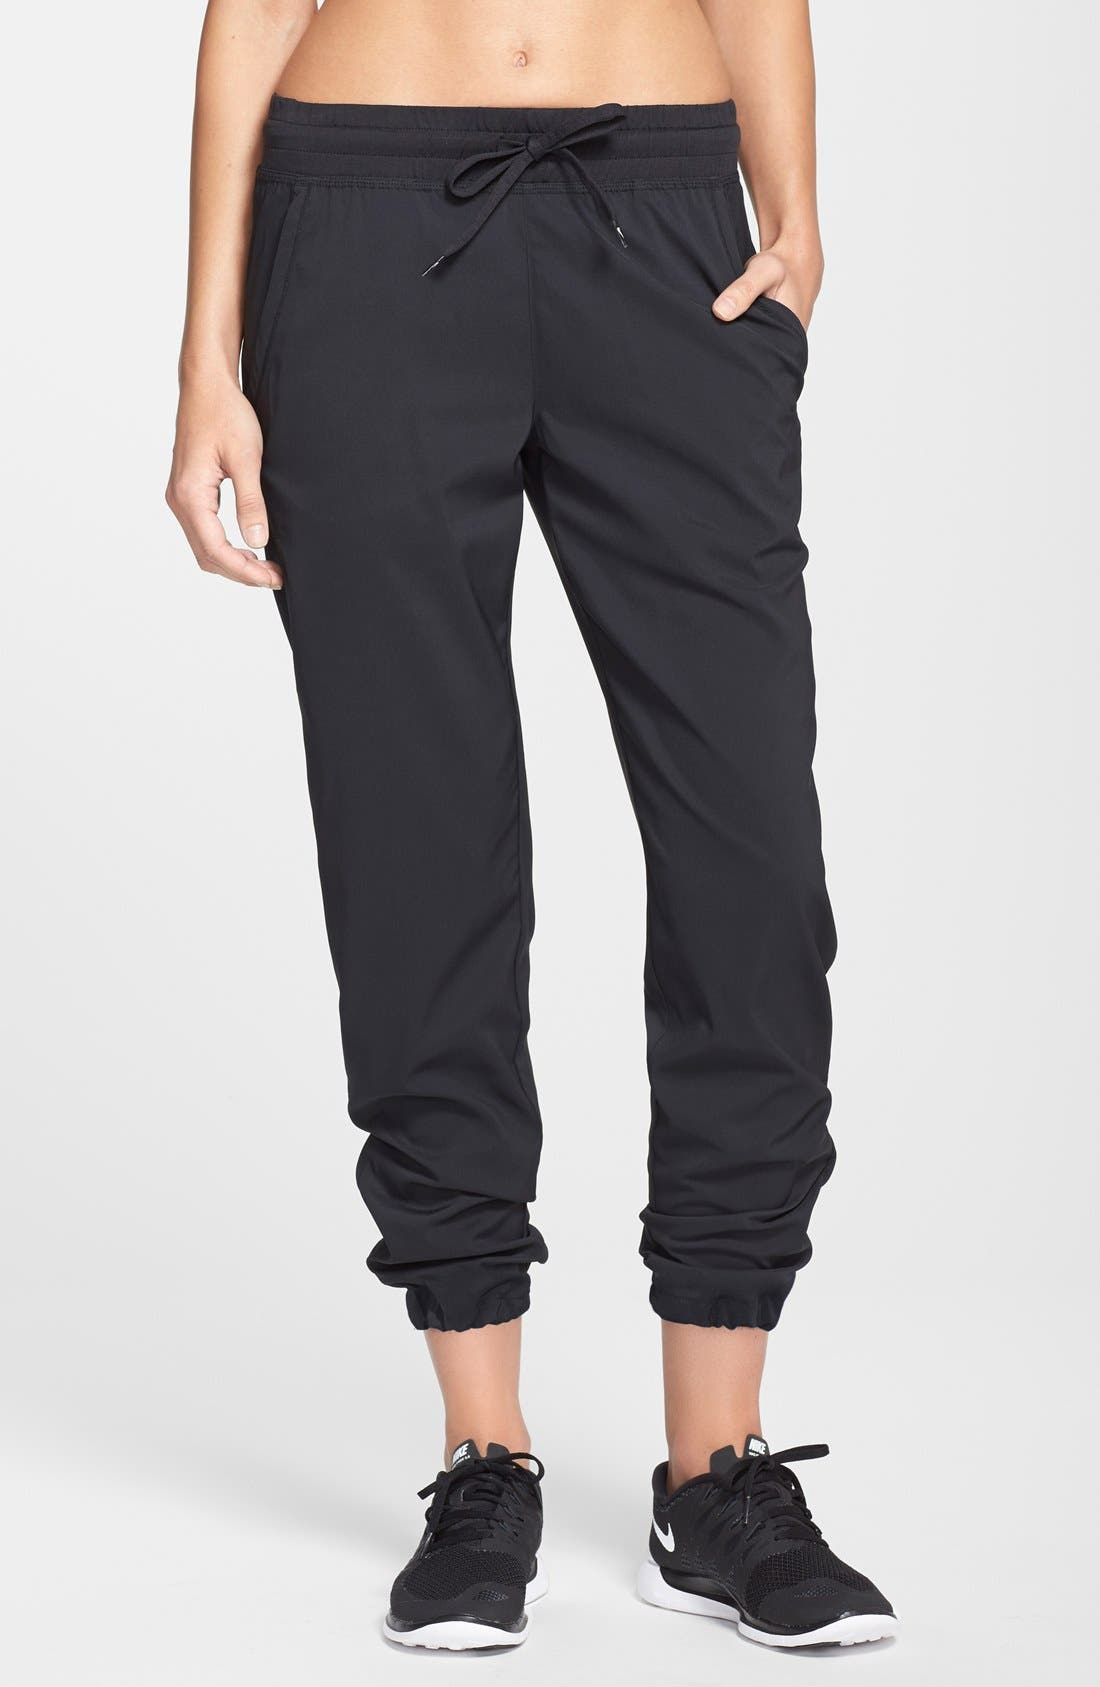 Main Image - Nike 'Revival' Woven Dri-FIT Sweatpants